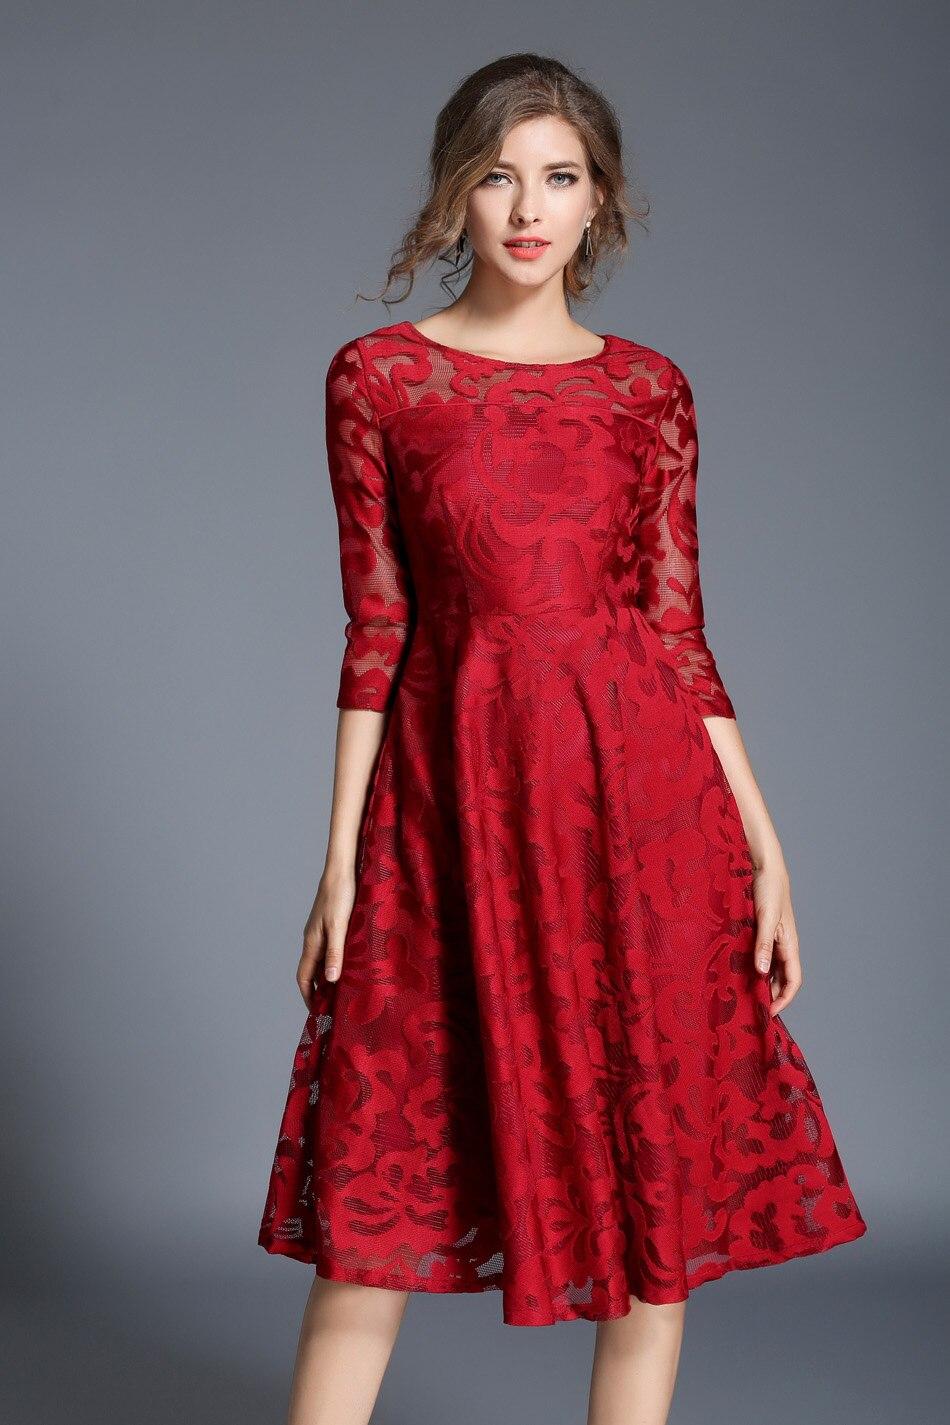 Bayan dantel elbise,bayan elbise,online elbise,ucuz elbise,elbise satın al,abiye elbise